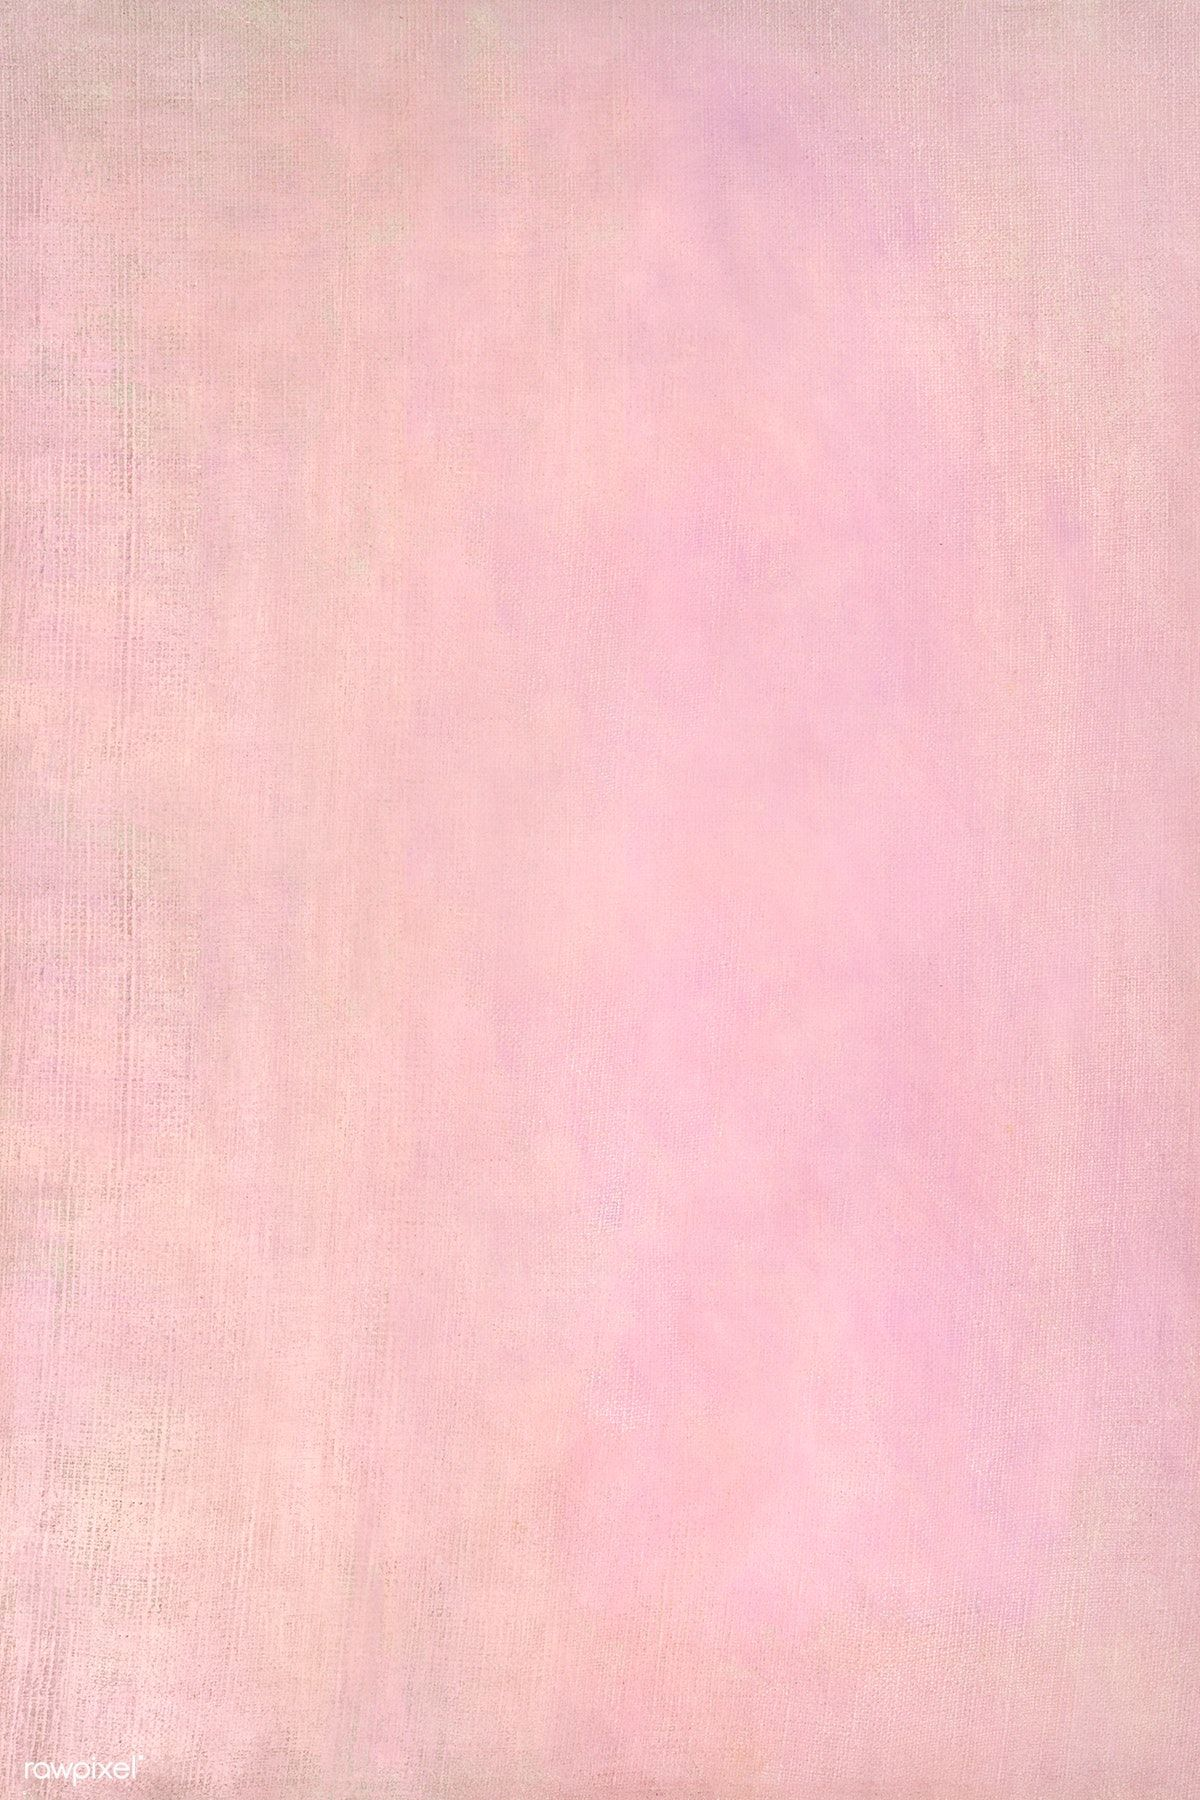 Download Premium Illustration Of Pastel Pink Oil Paint Textured